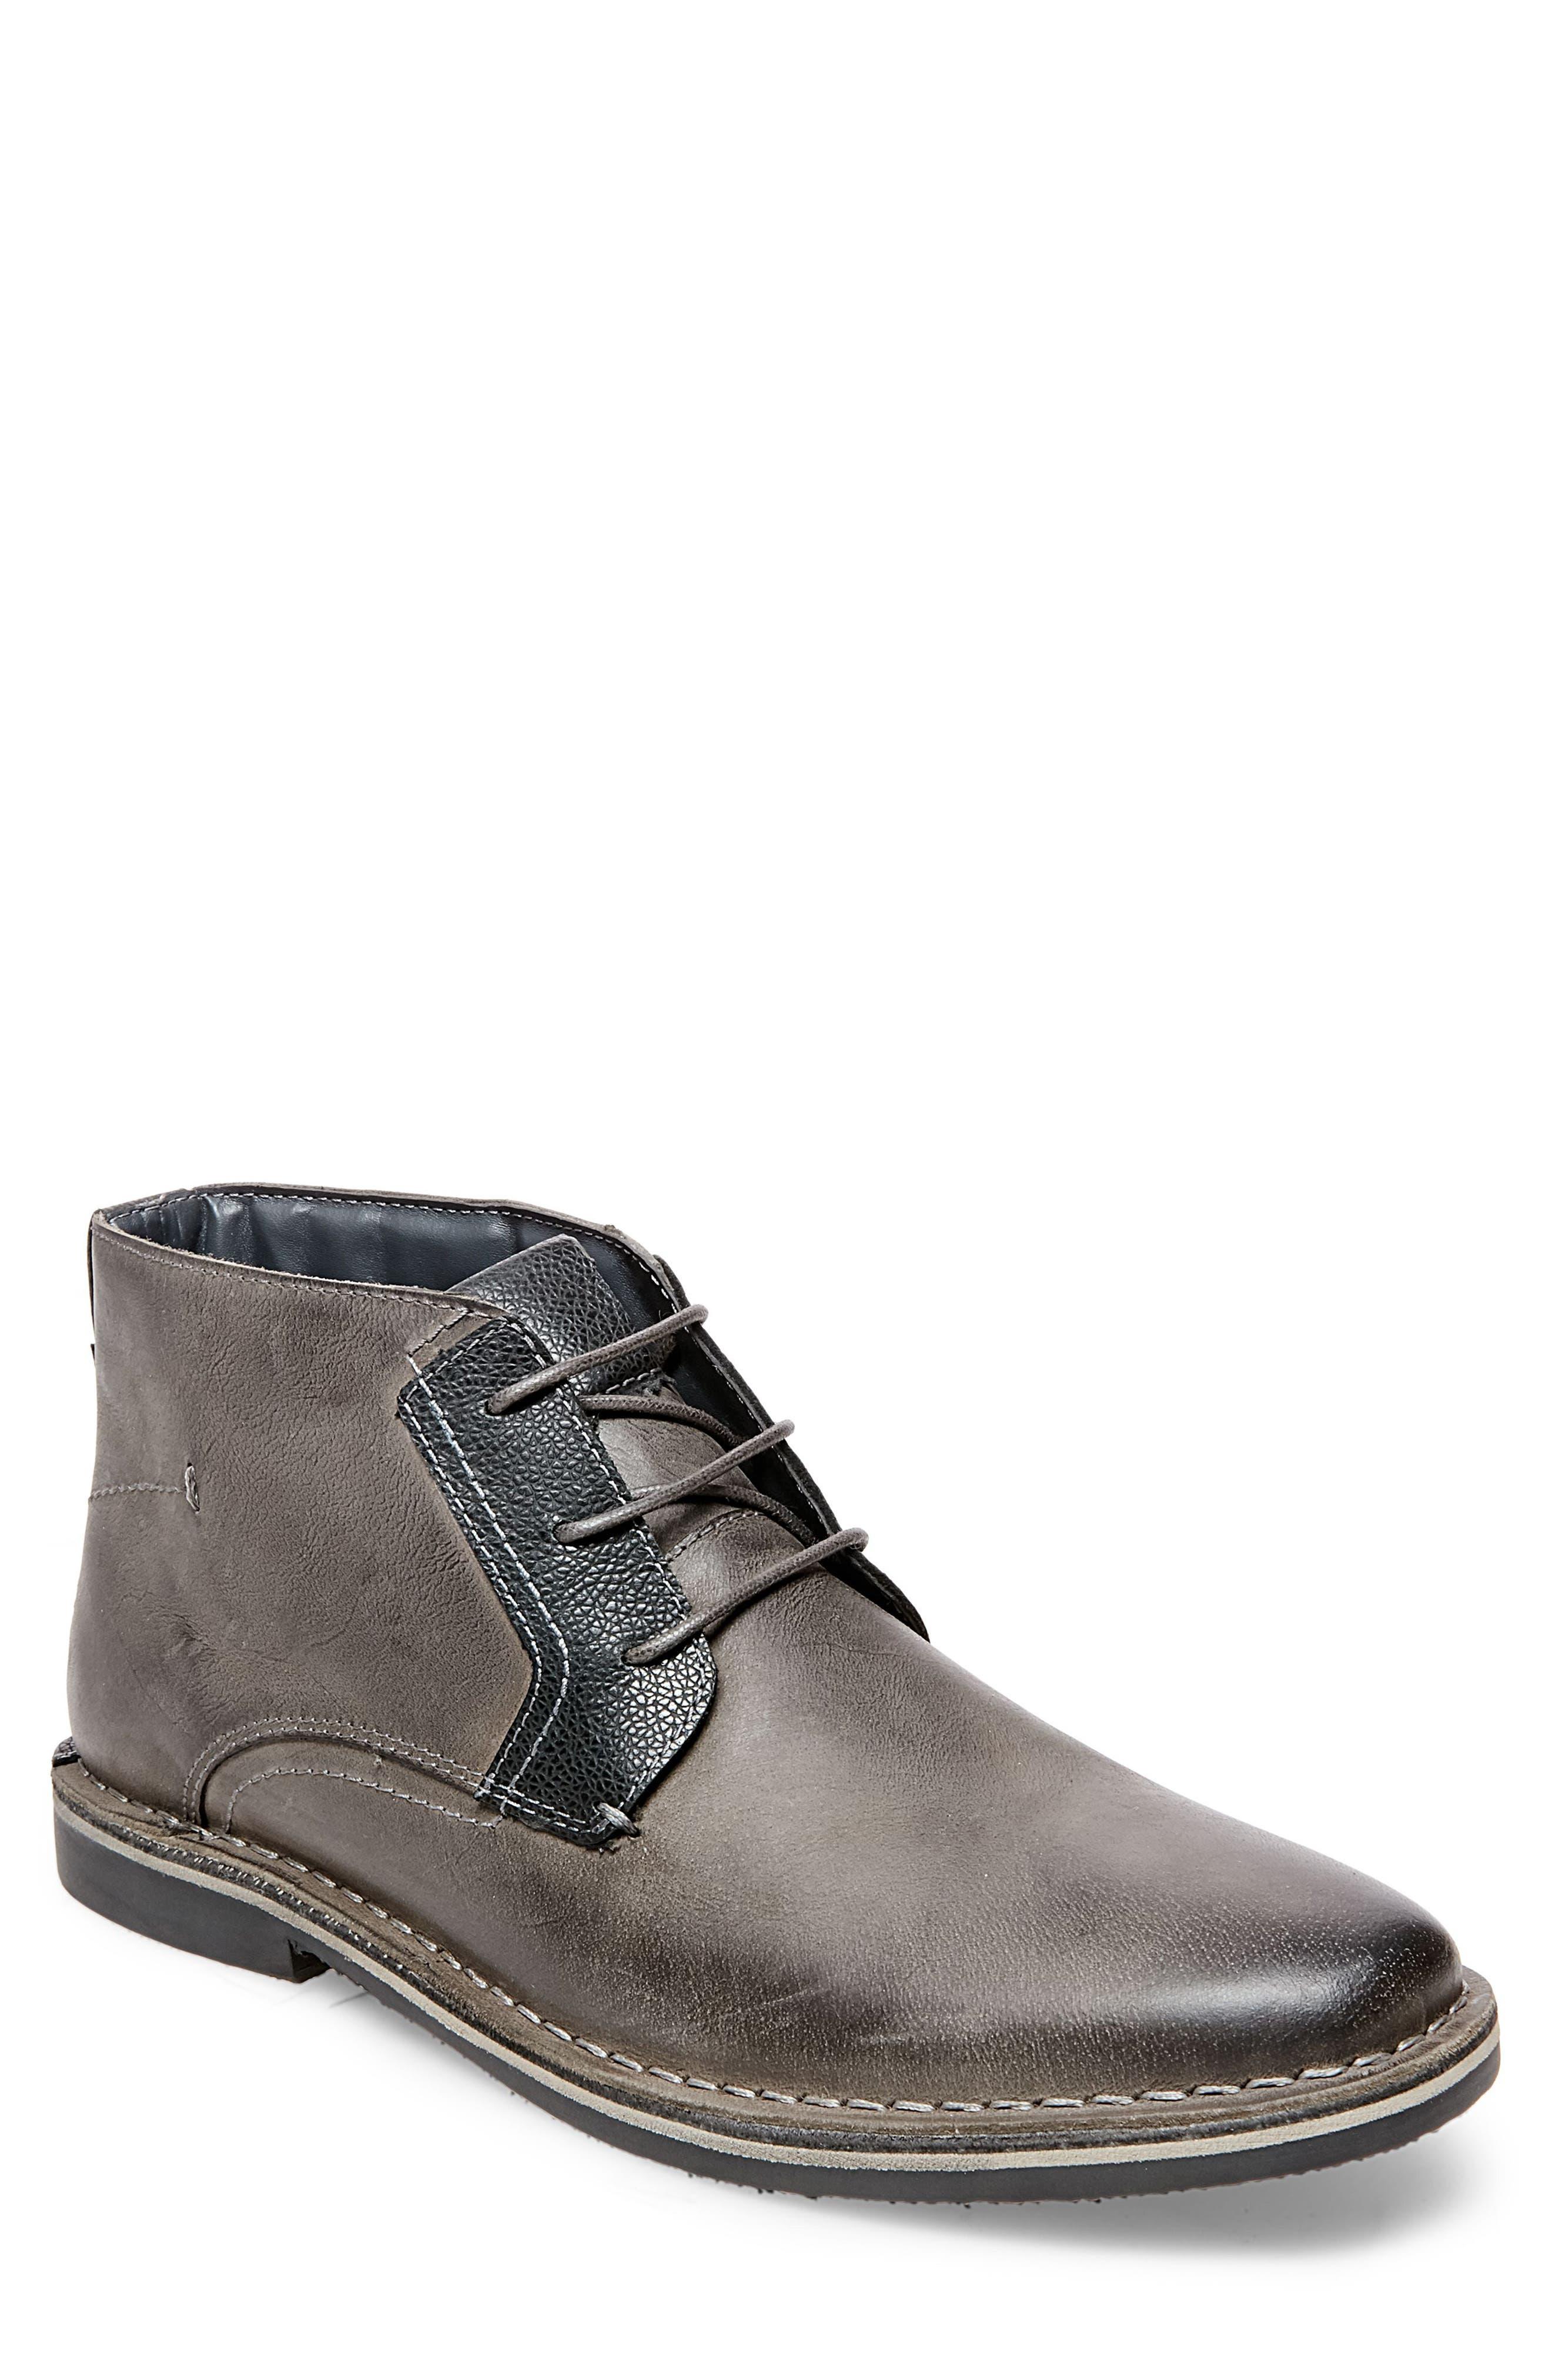 Herrin Chukka Boot,                         Main,                         color, 020